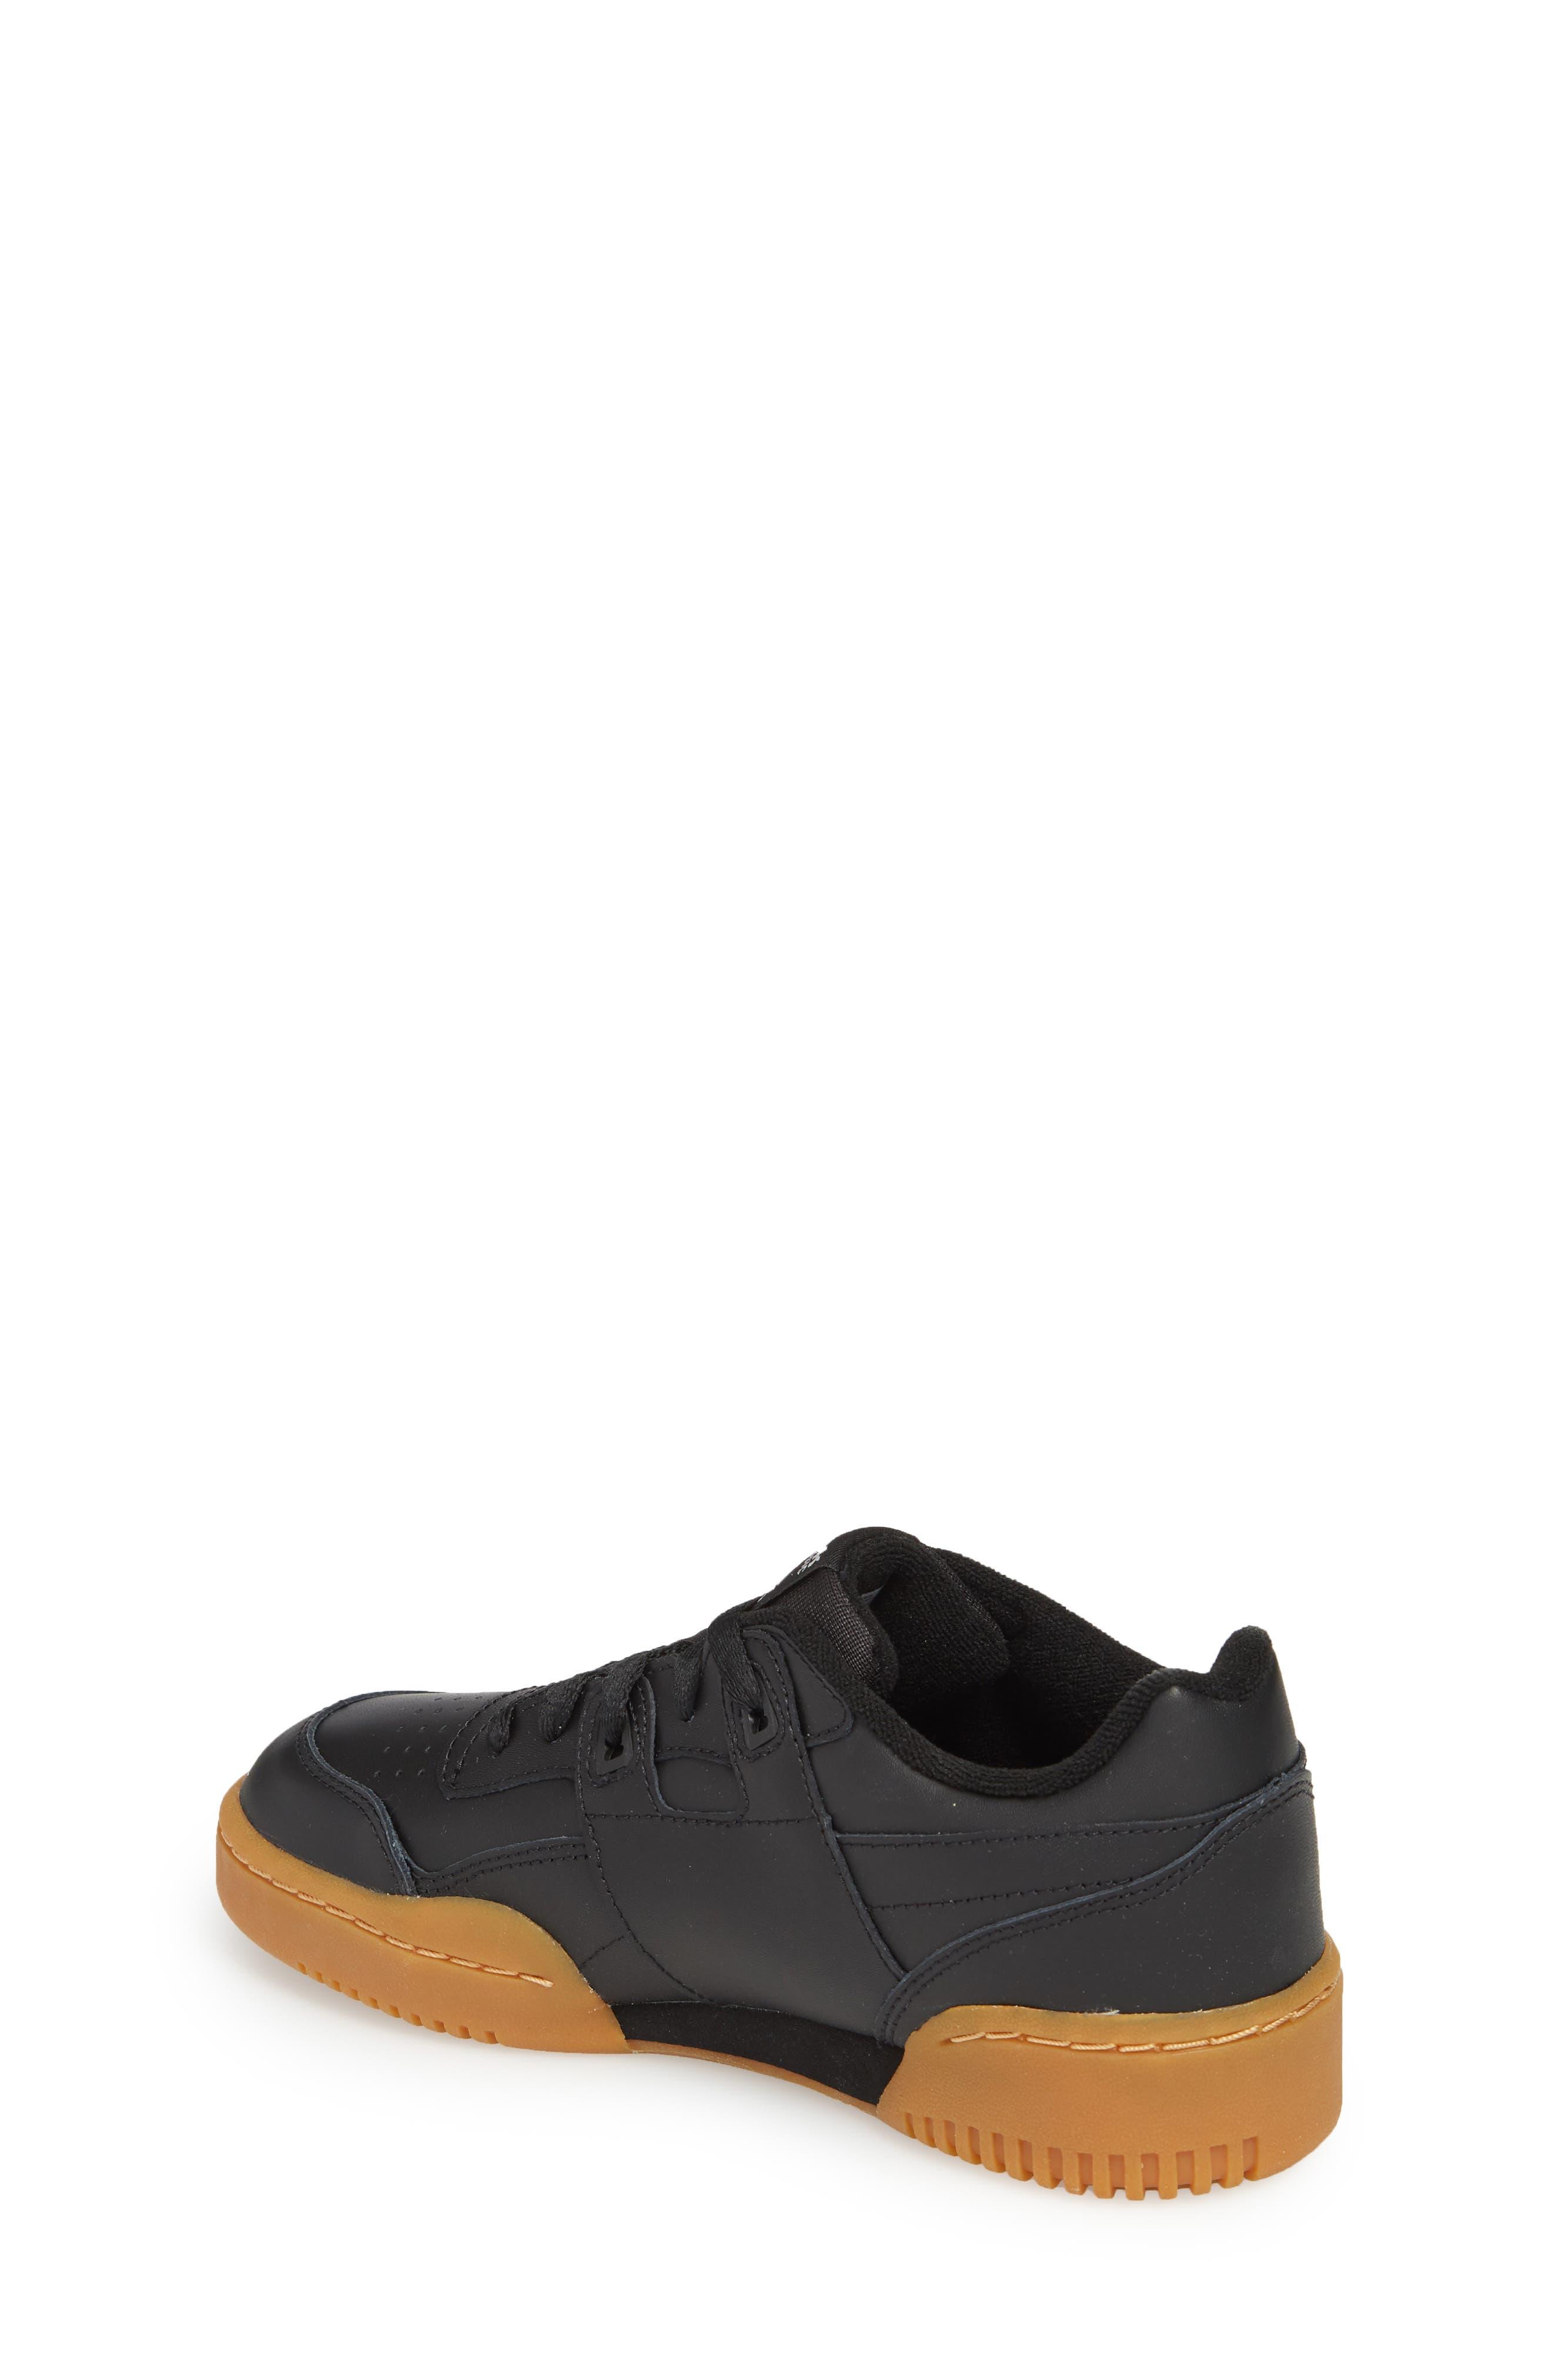 Workout Plus Sneaker,                             Alternate thumbnail 2, color,                             BLACK